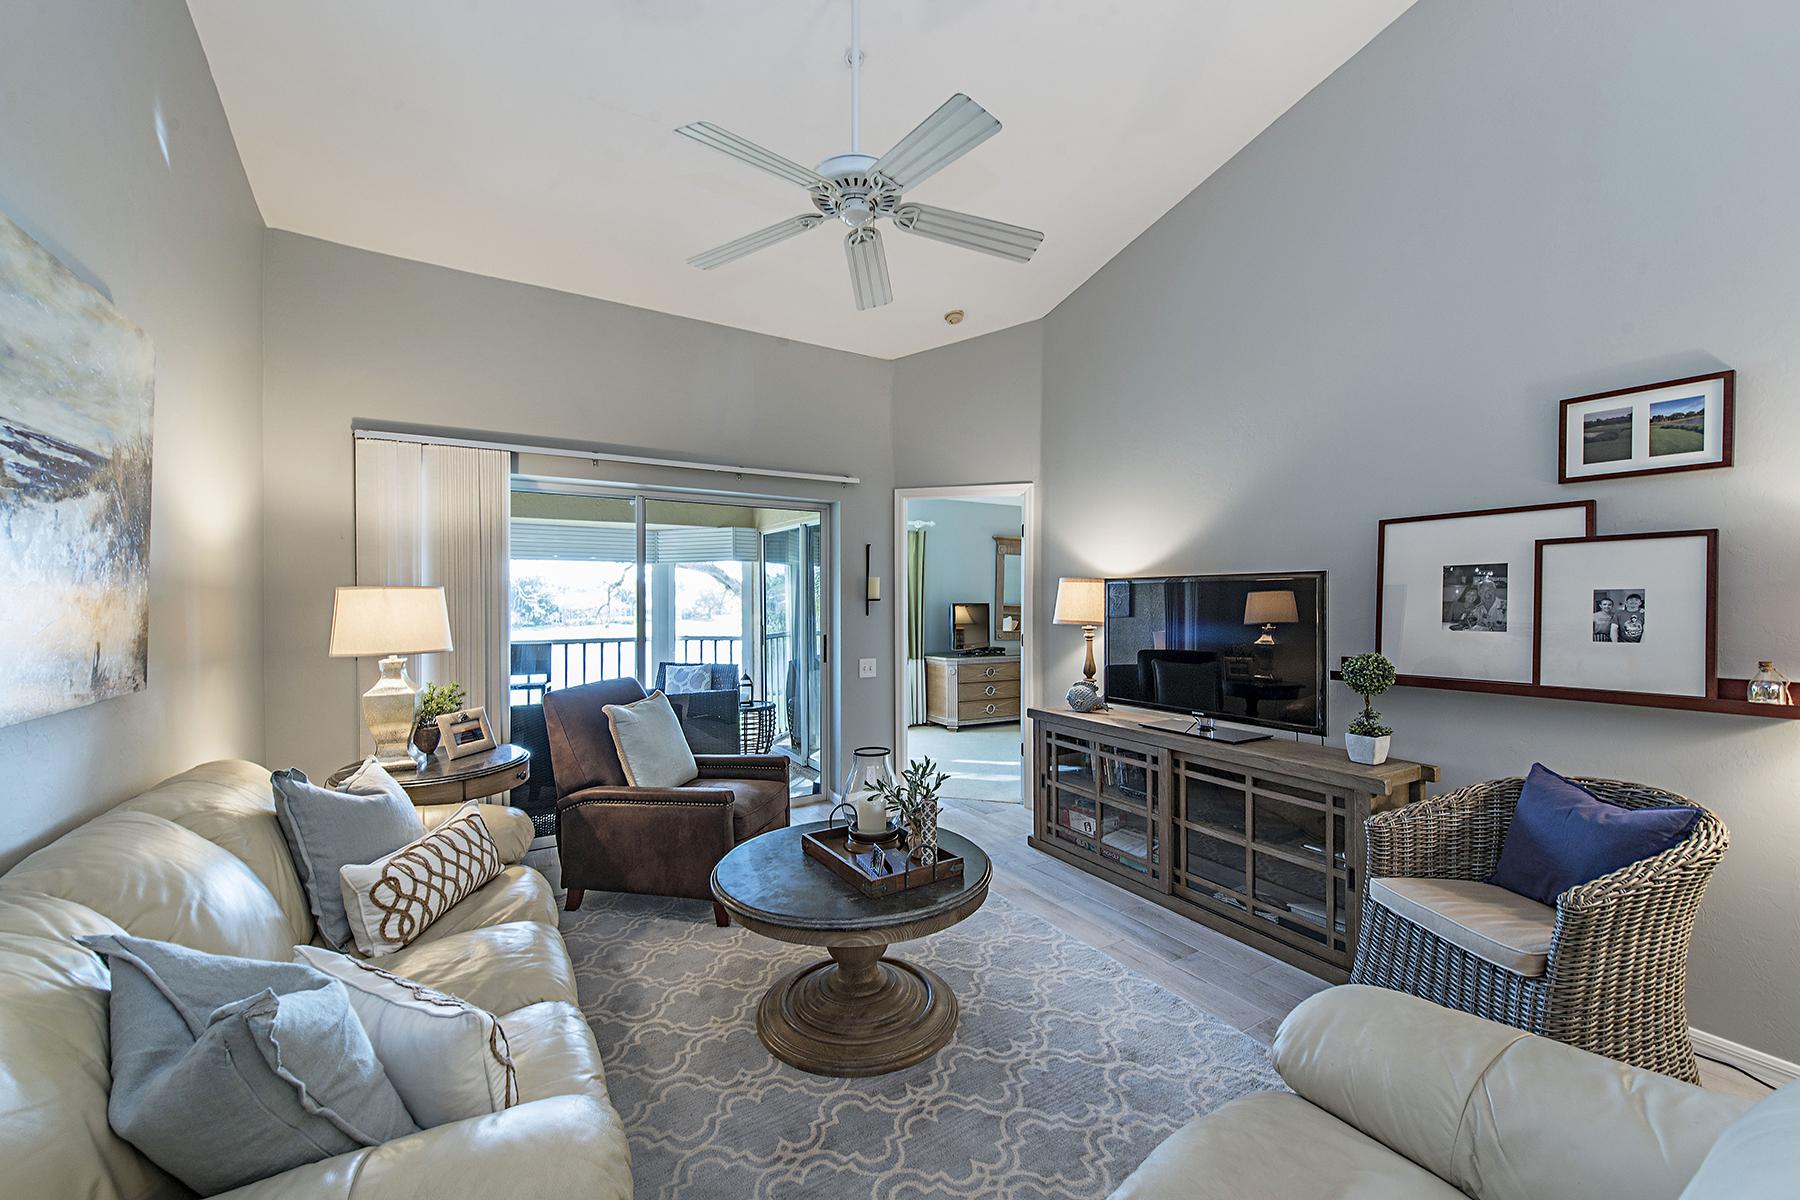 Condominium for Sale at WORTHINGTON 13010 Amberley Ct 212 Bonita Springs, Florida, 34135 United States